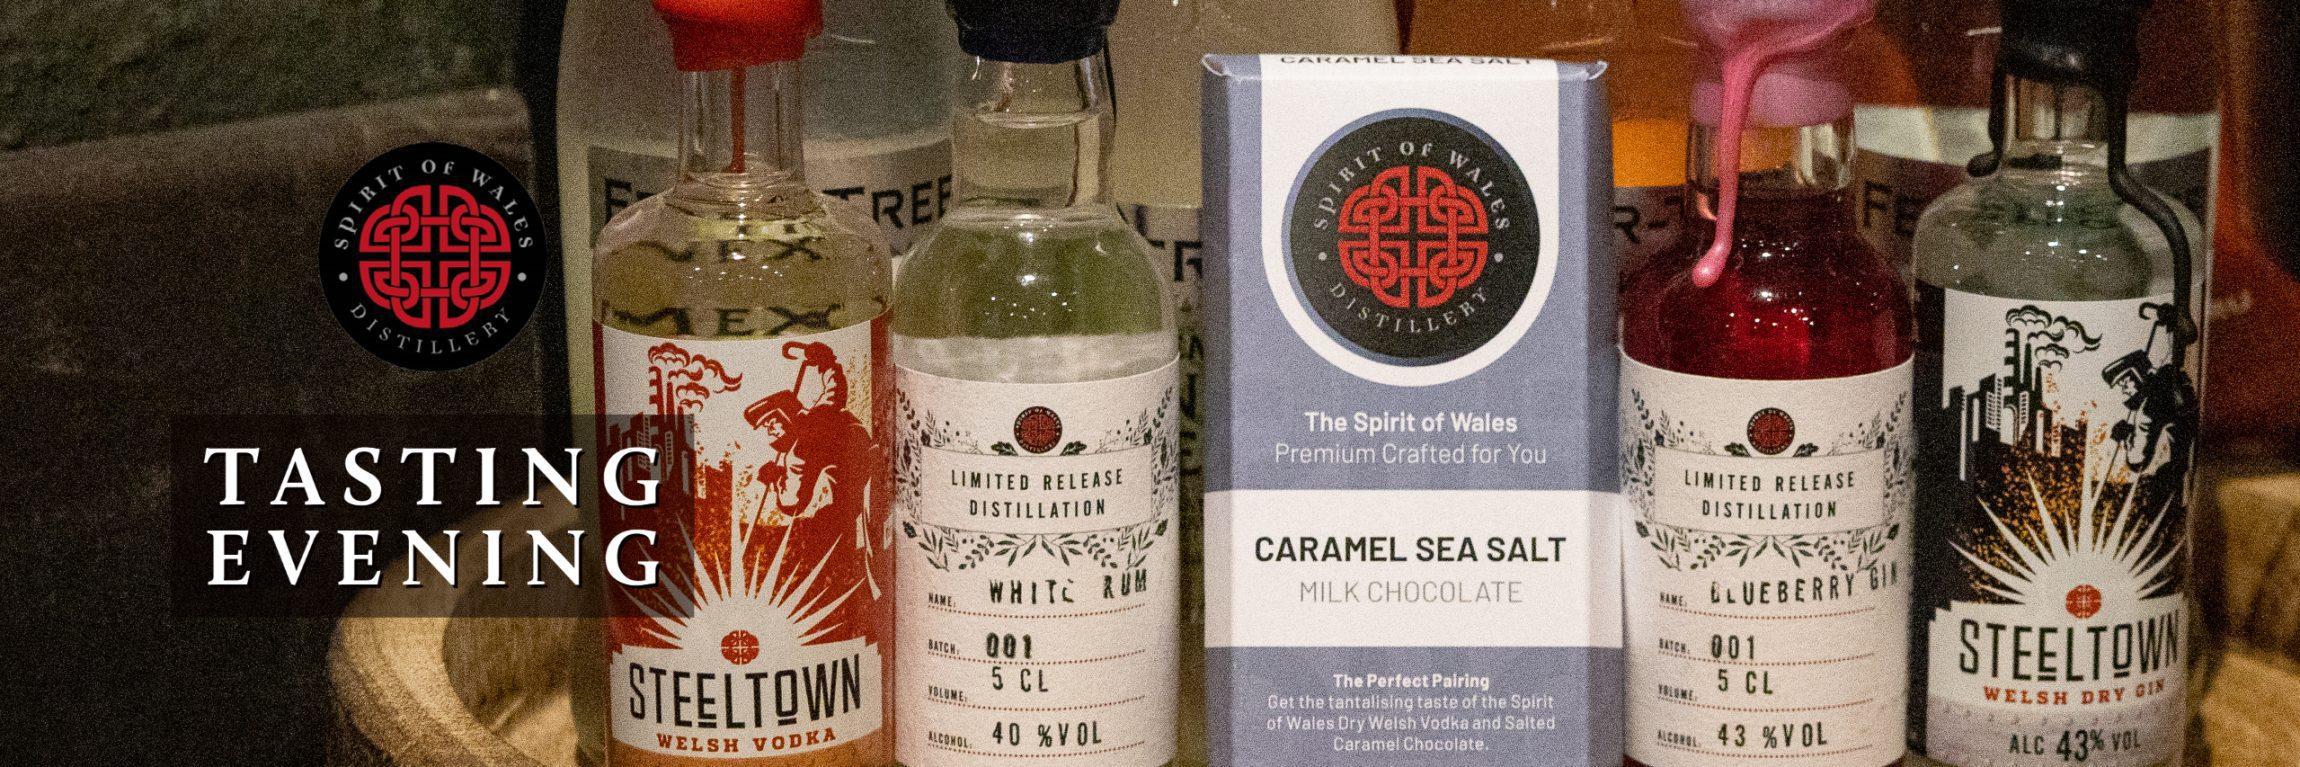 Spirit of Wales Distillery - Live Tasting Evening tasting kit